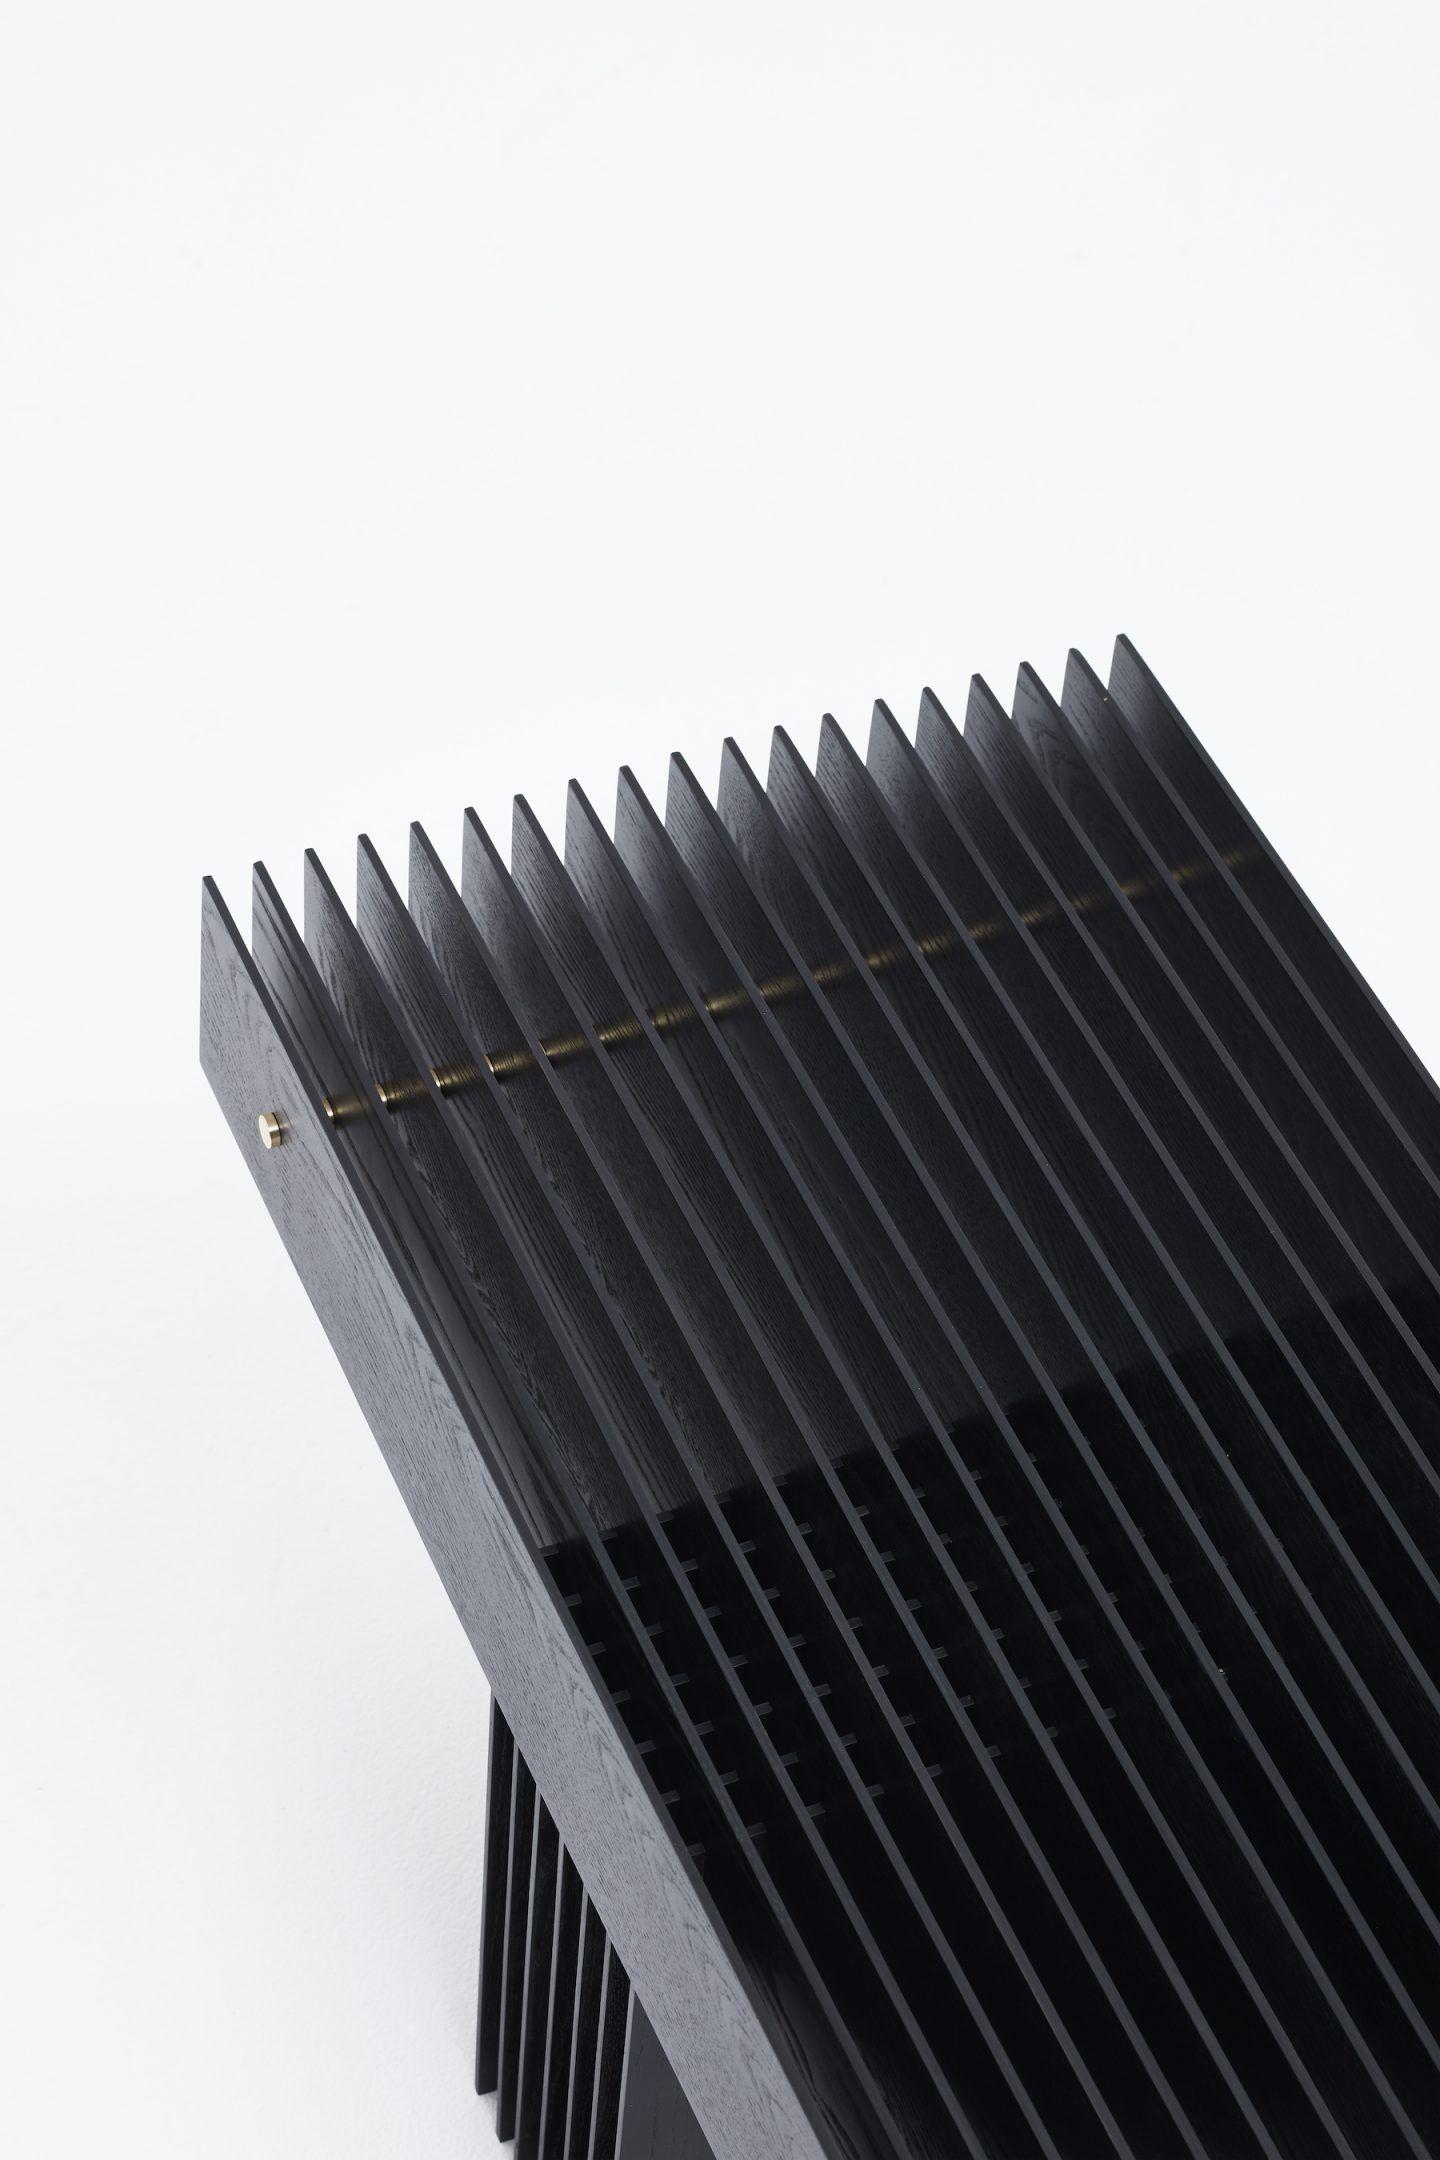 IGNANT-Design-Mario-Tsai-Grid-Bench-11